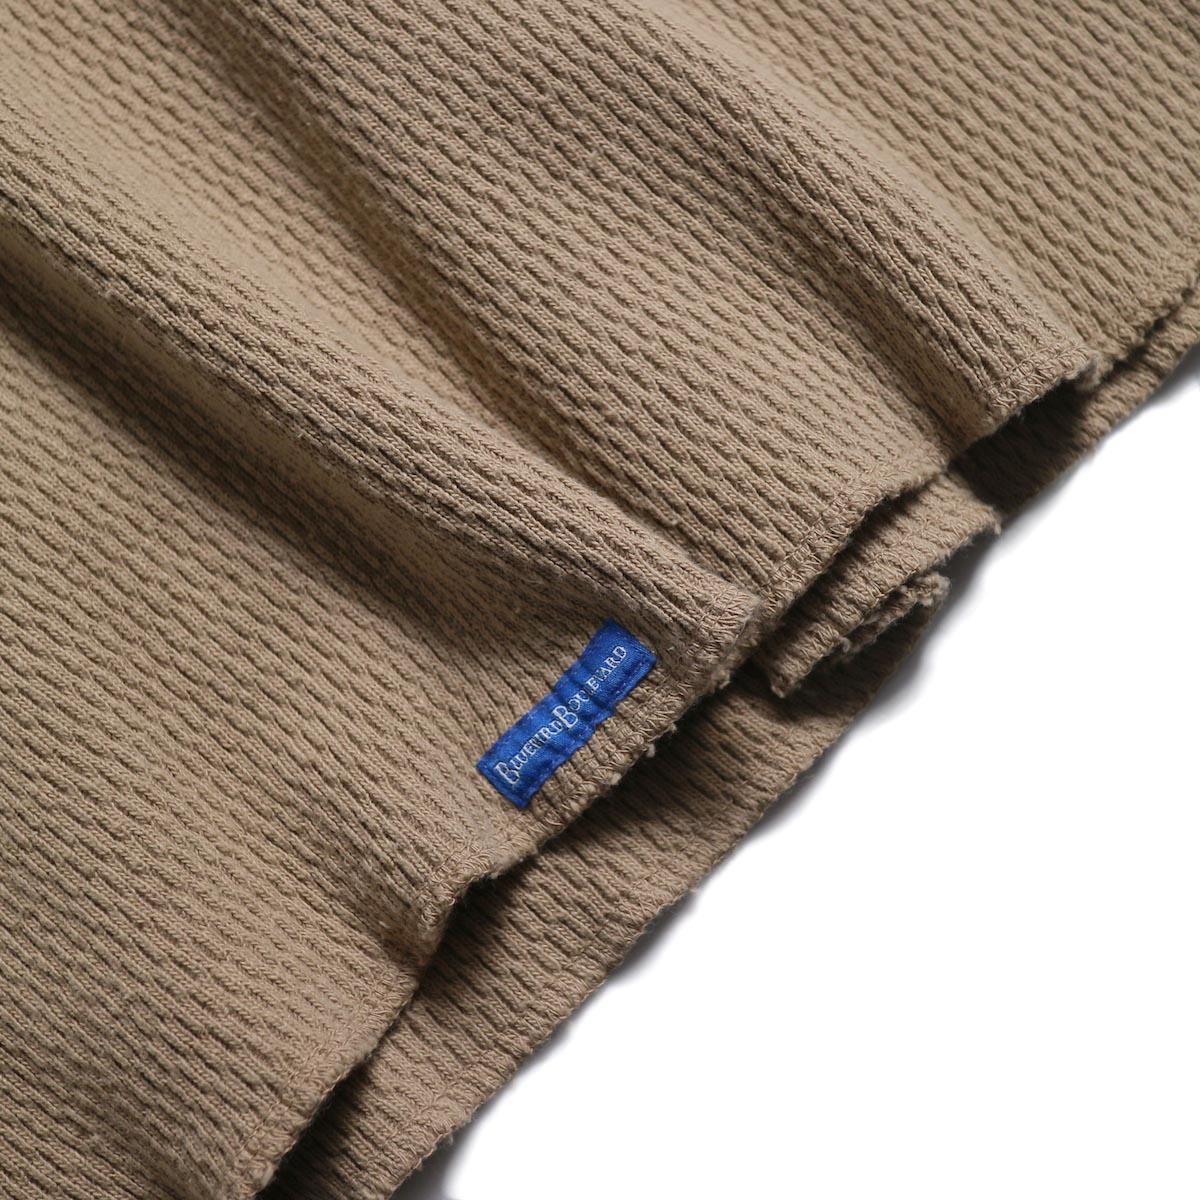 BLUEBIRD BOULEVARD / ハニカムワッフルトップ(オーバーダイ) -Beige 裾